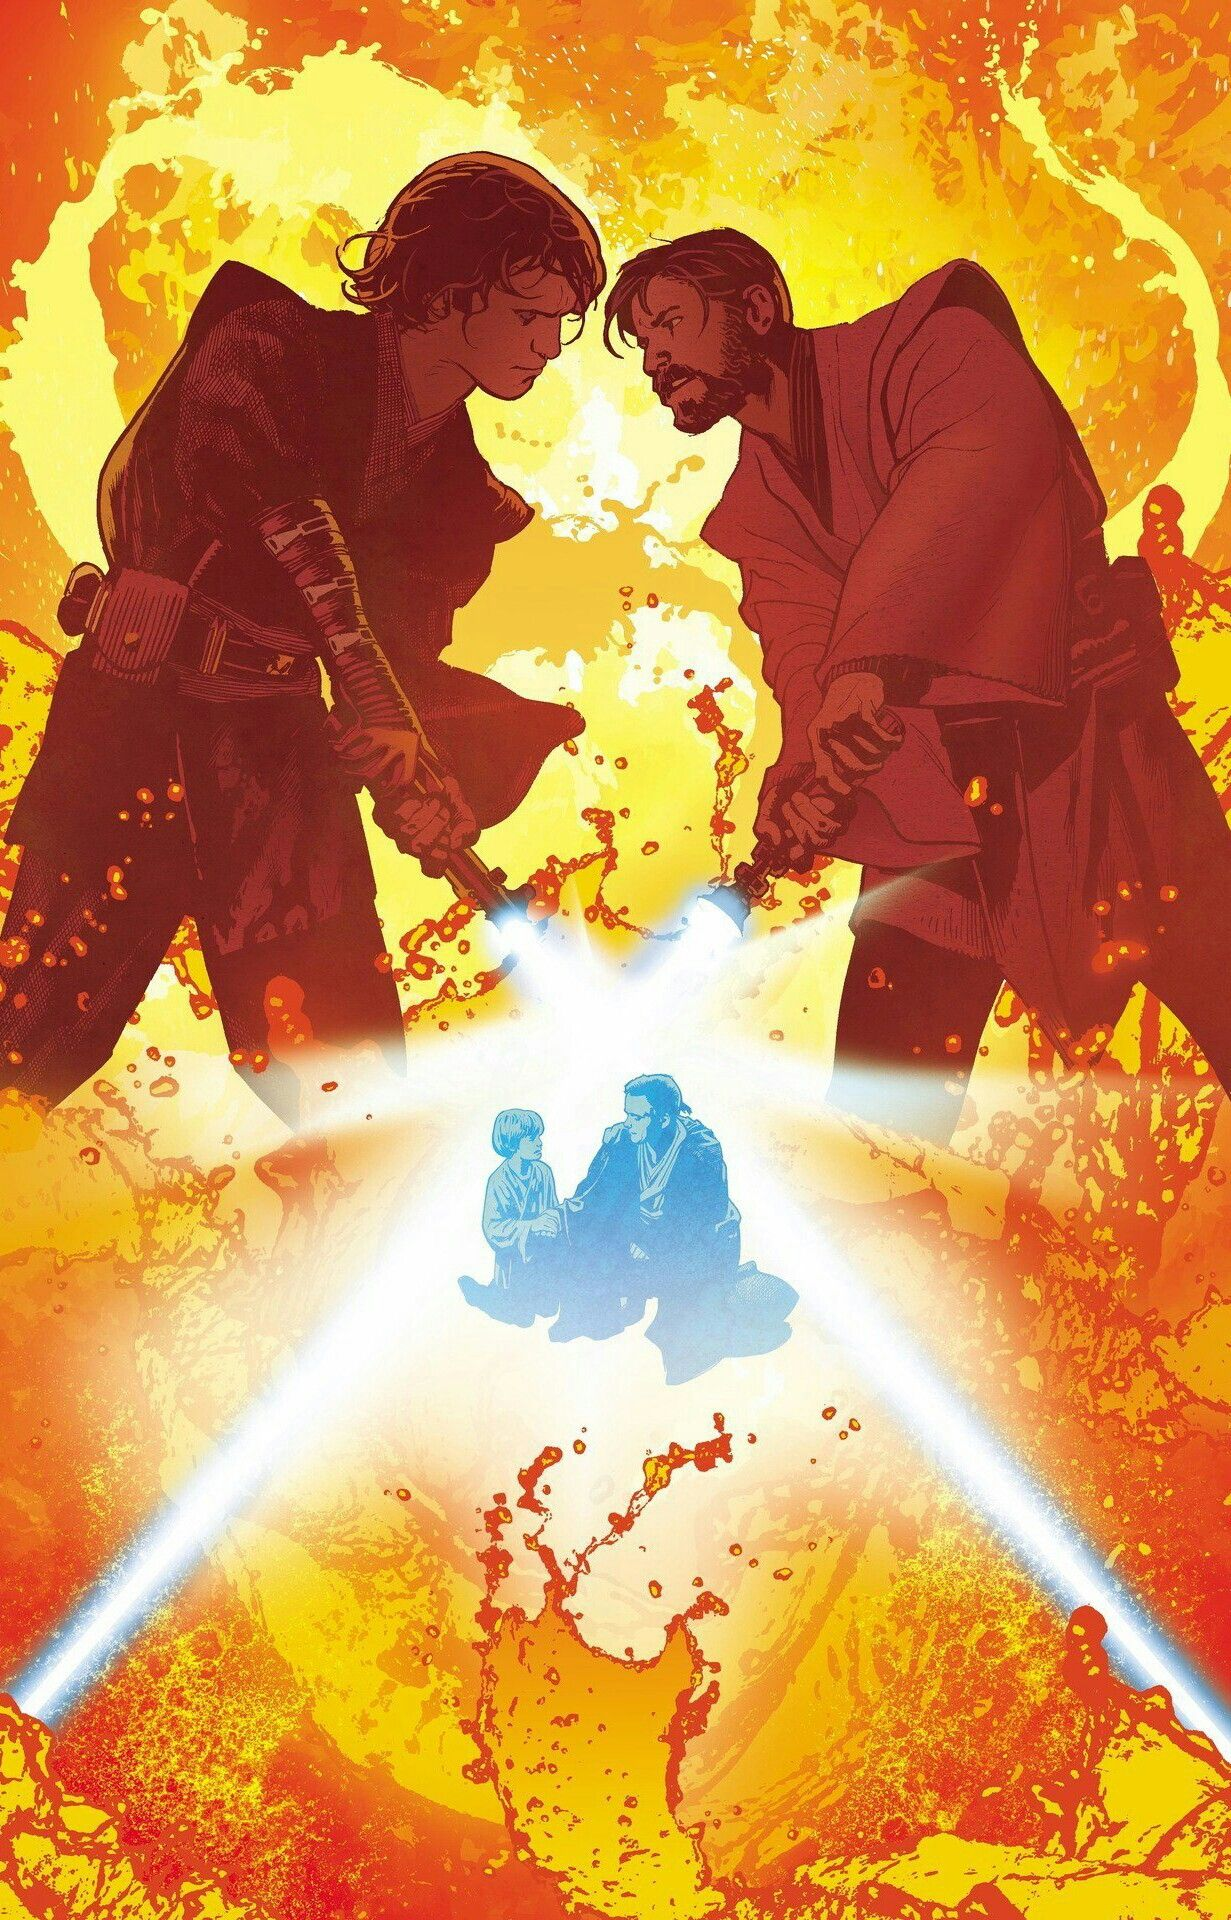 Anakin Skywalker Versus Obi Wan Kenobi Star Wars Pictures Star Wars Anakin Star Wars Images